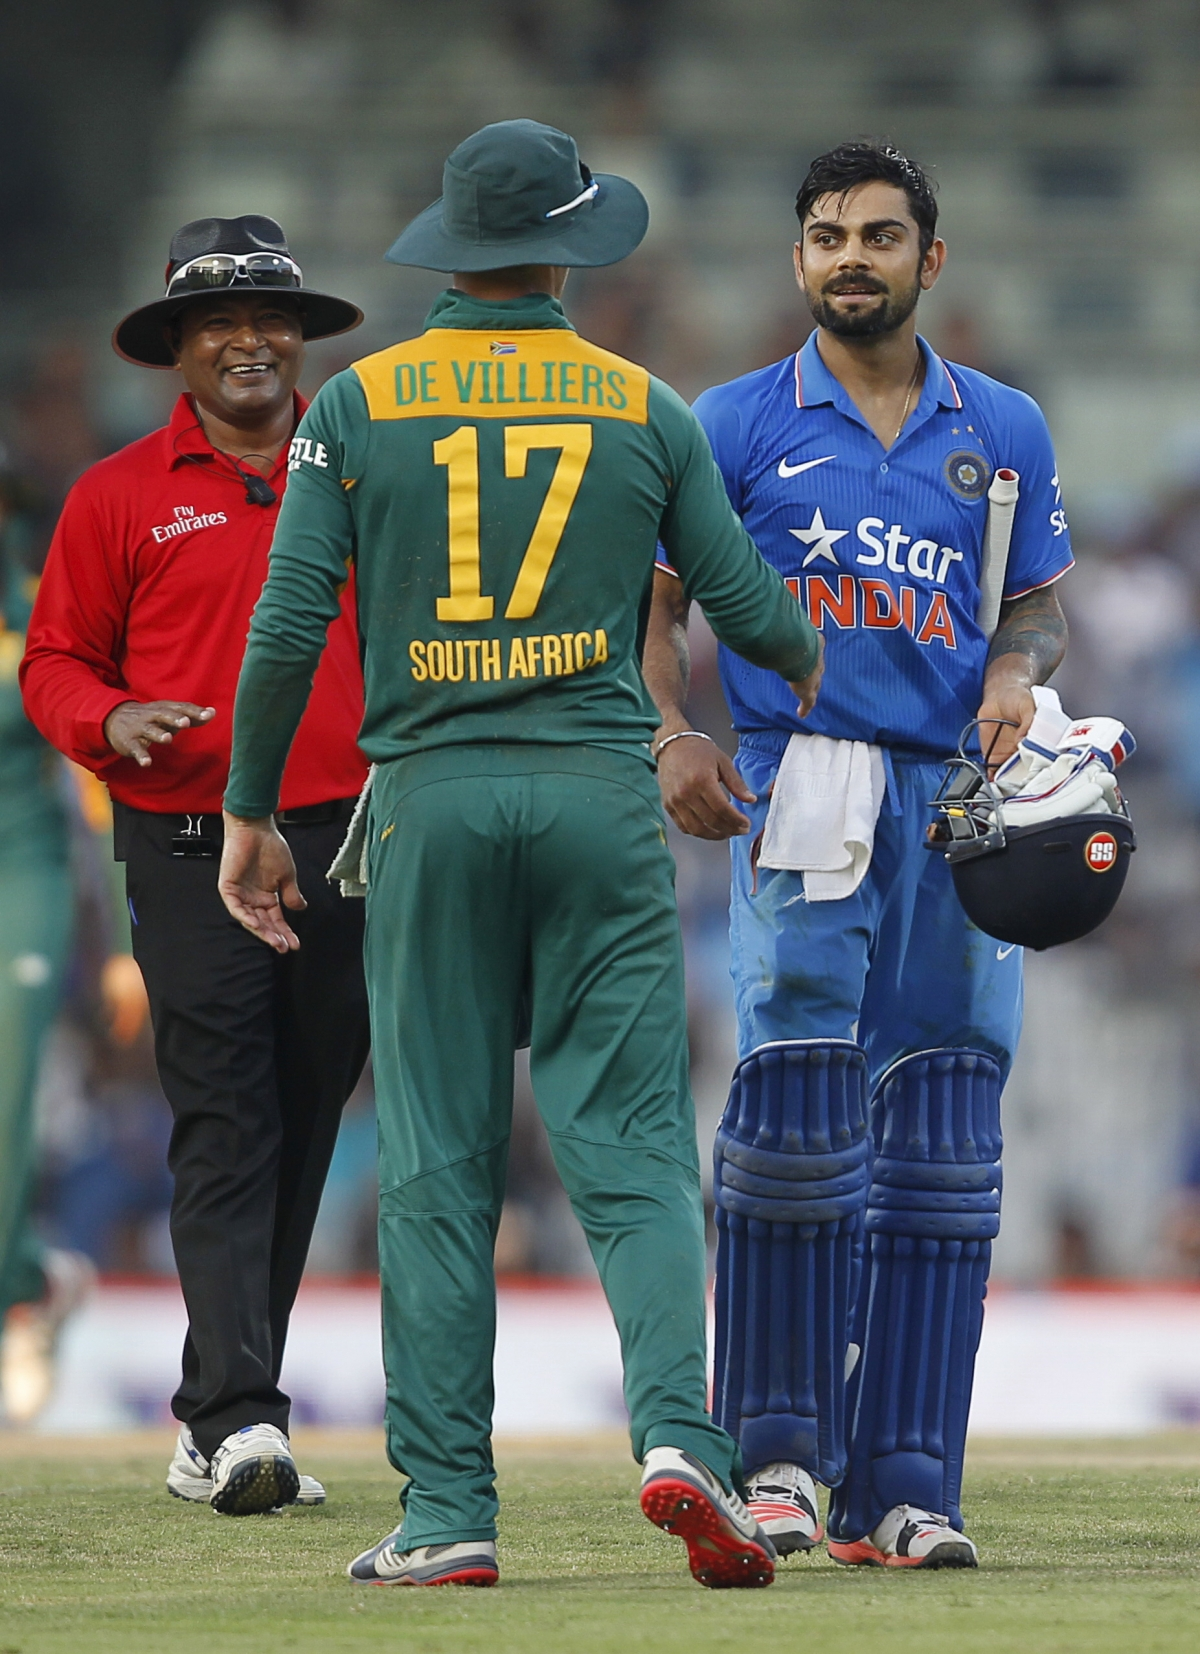 Virat Kohli Is My Favourite Cricketer Says AB De Villiers